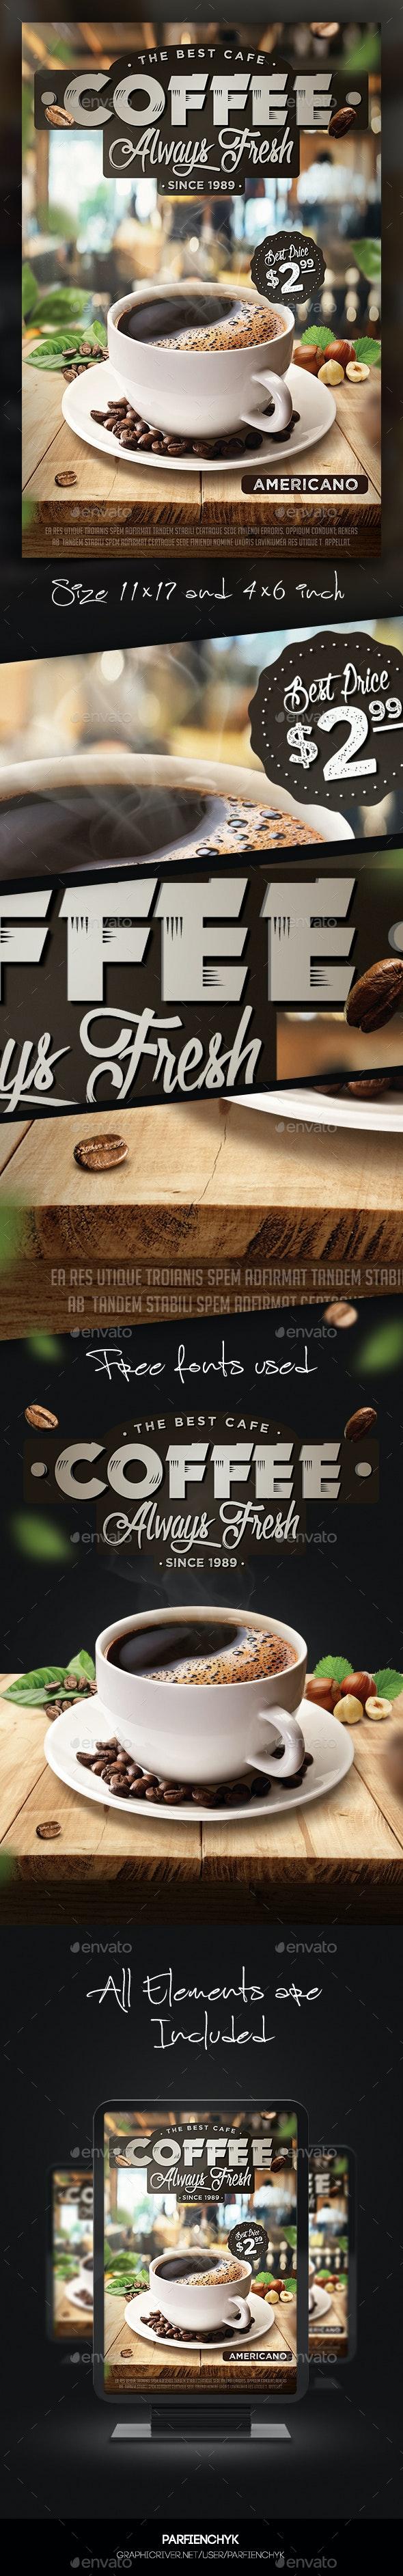 Coffee Flyer Template - Restaurant Flyers